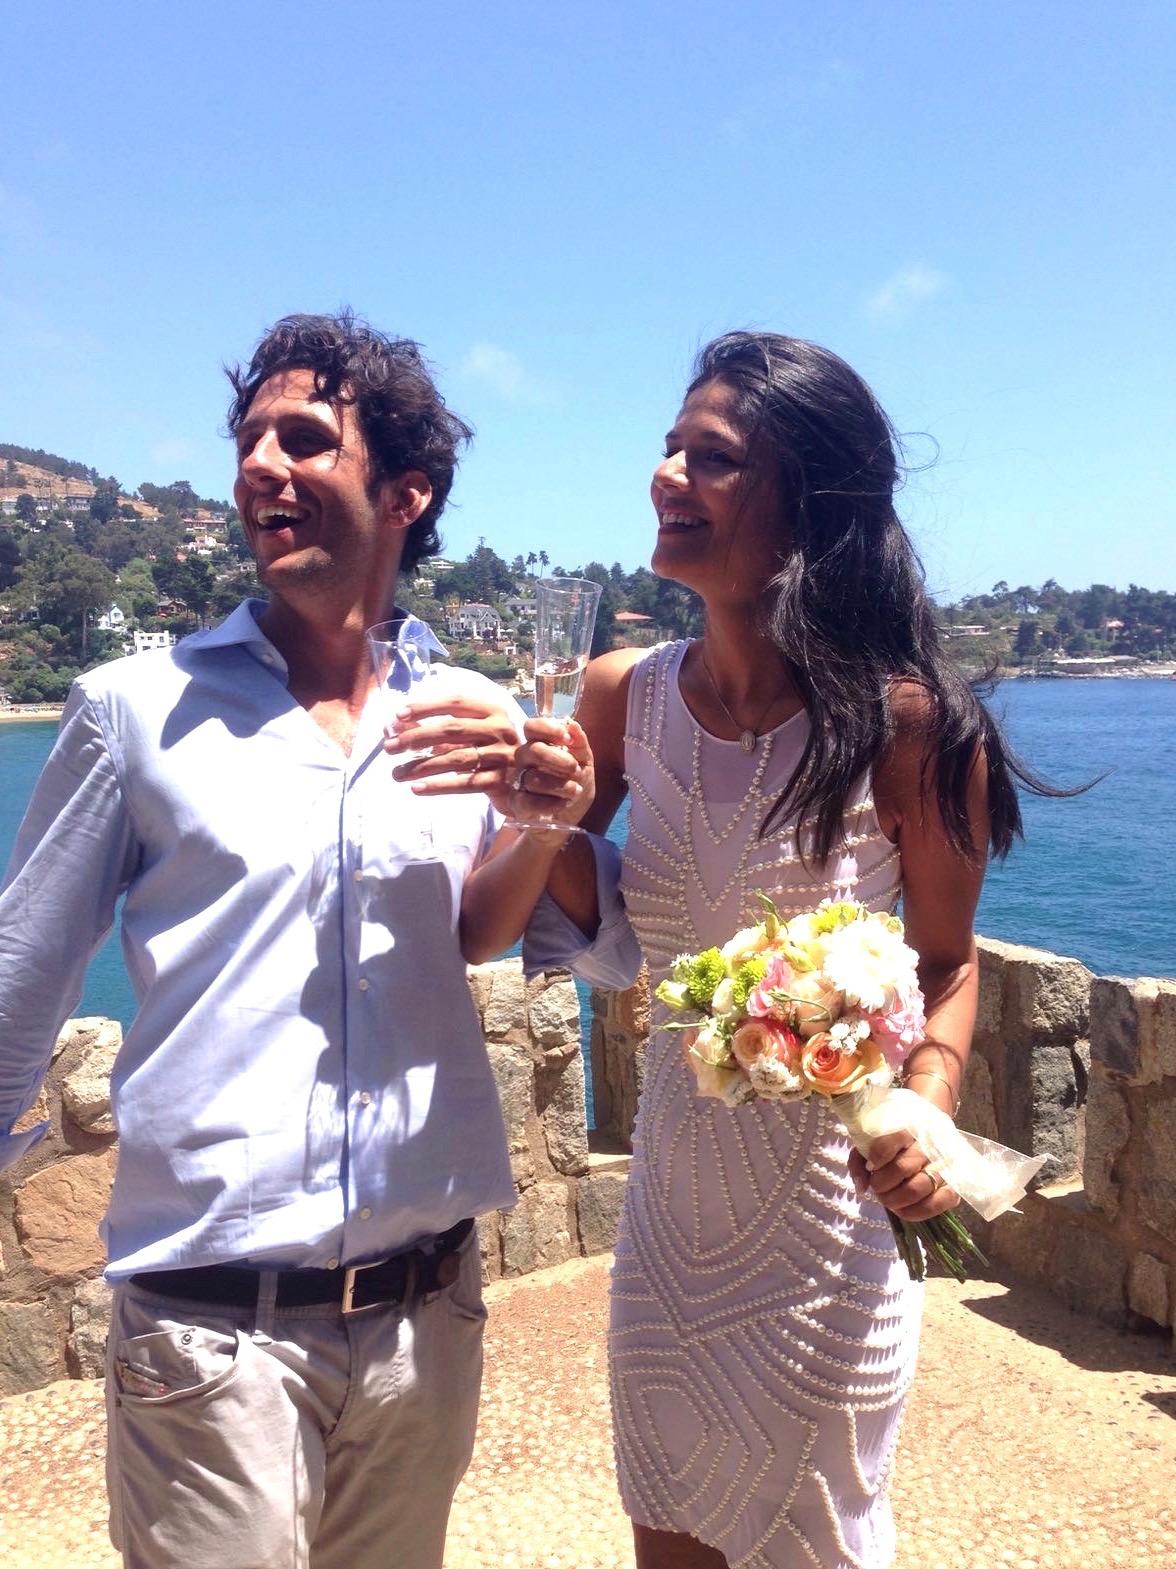 casamento-civil-beta-pinheiro-fabio-distaso-zapallar-chile-janeiro-2016